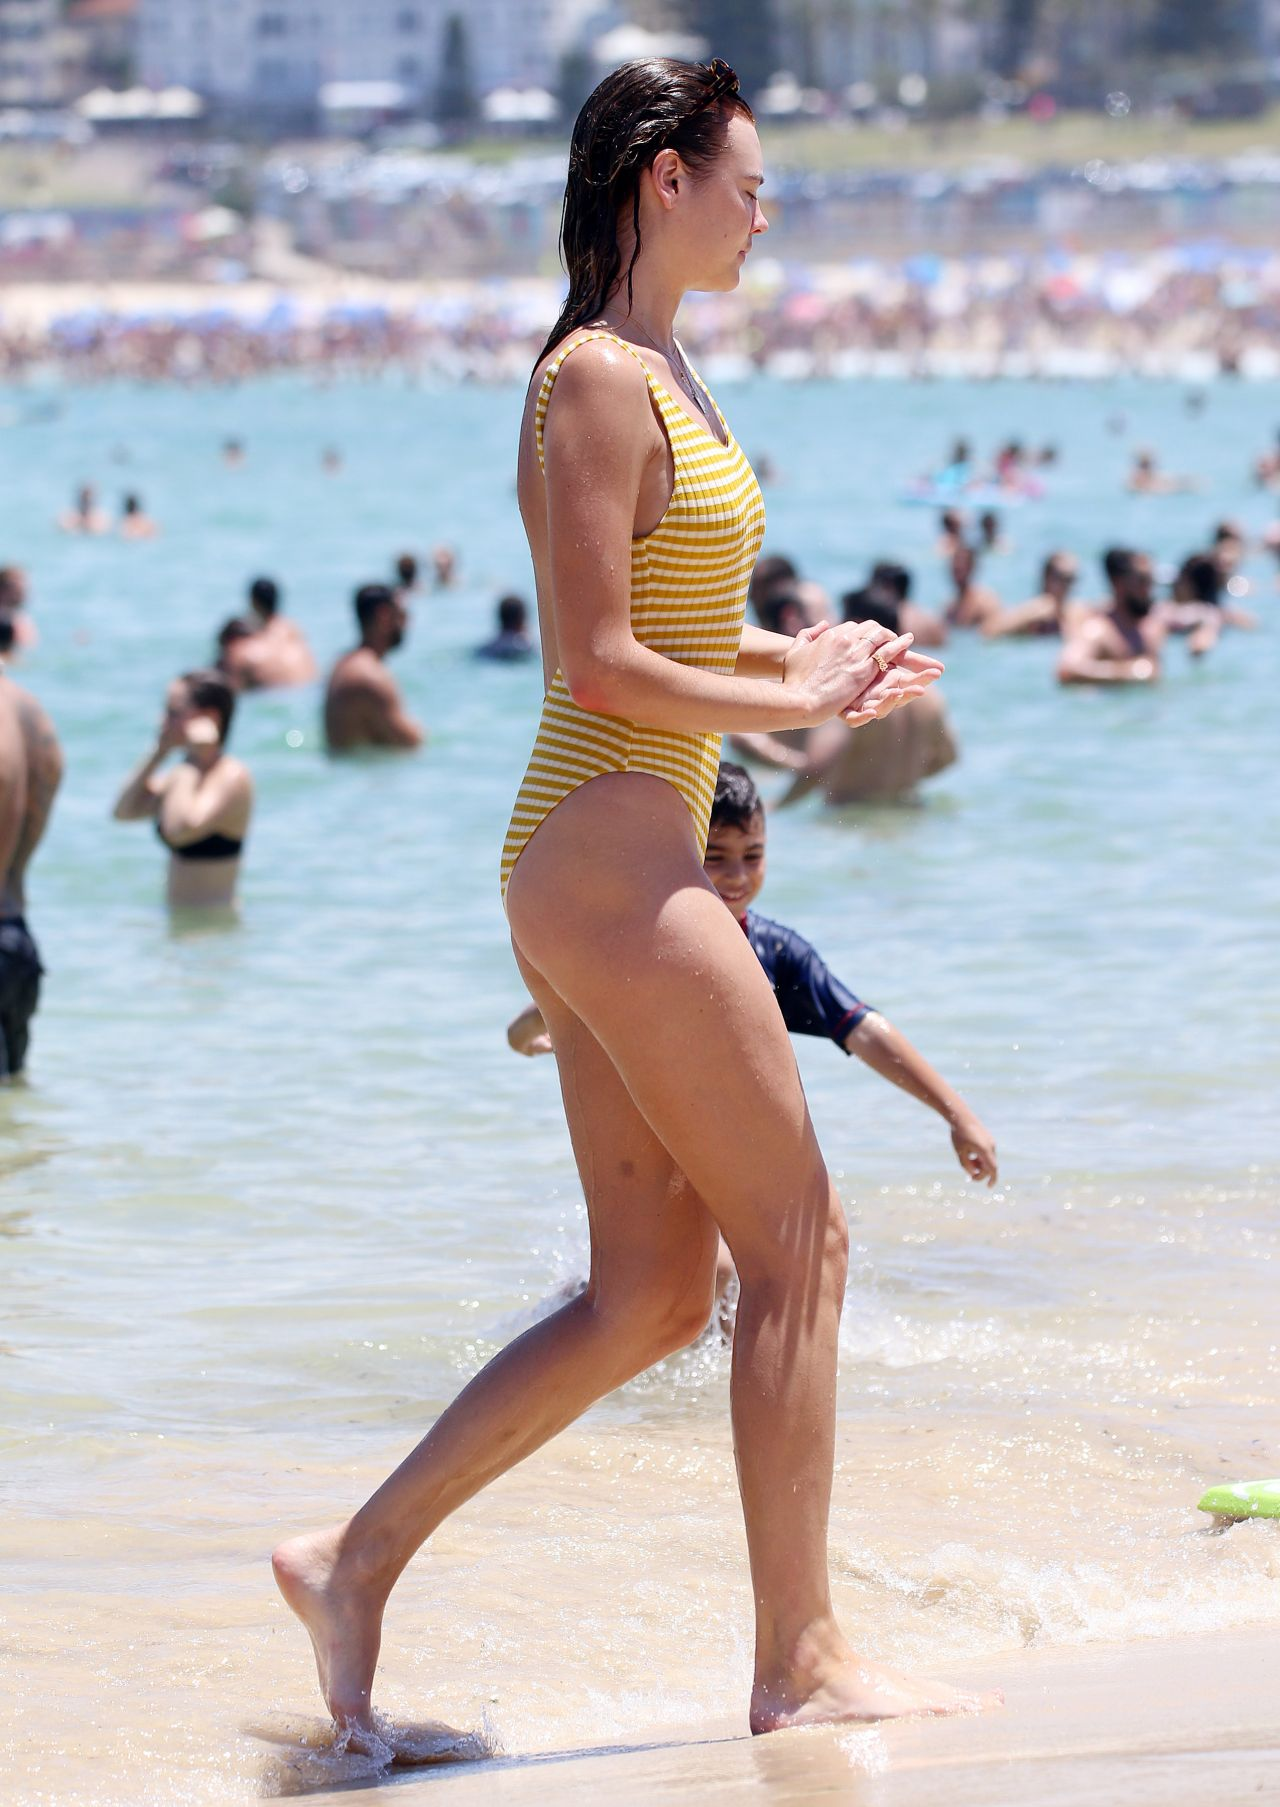 Montana Cox in Black Bikini at Tamarama beach in Sydney Pic 32 of 35